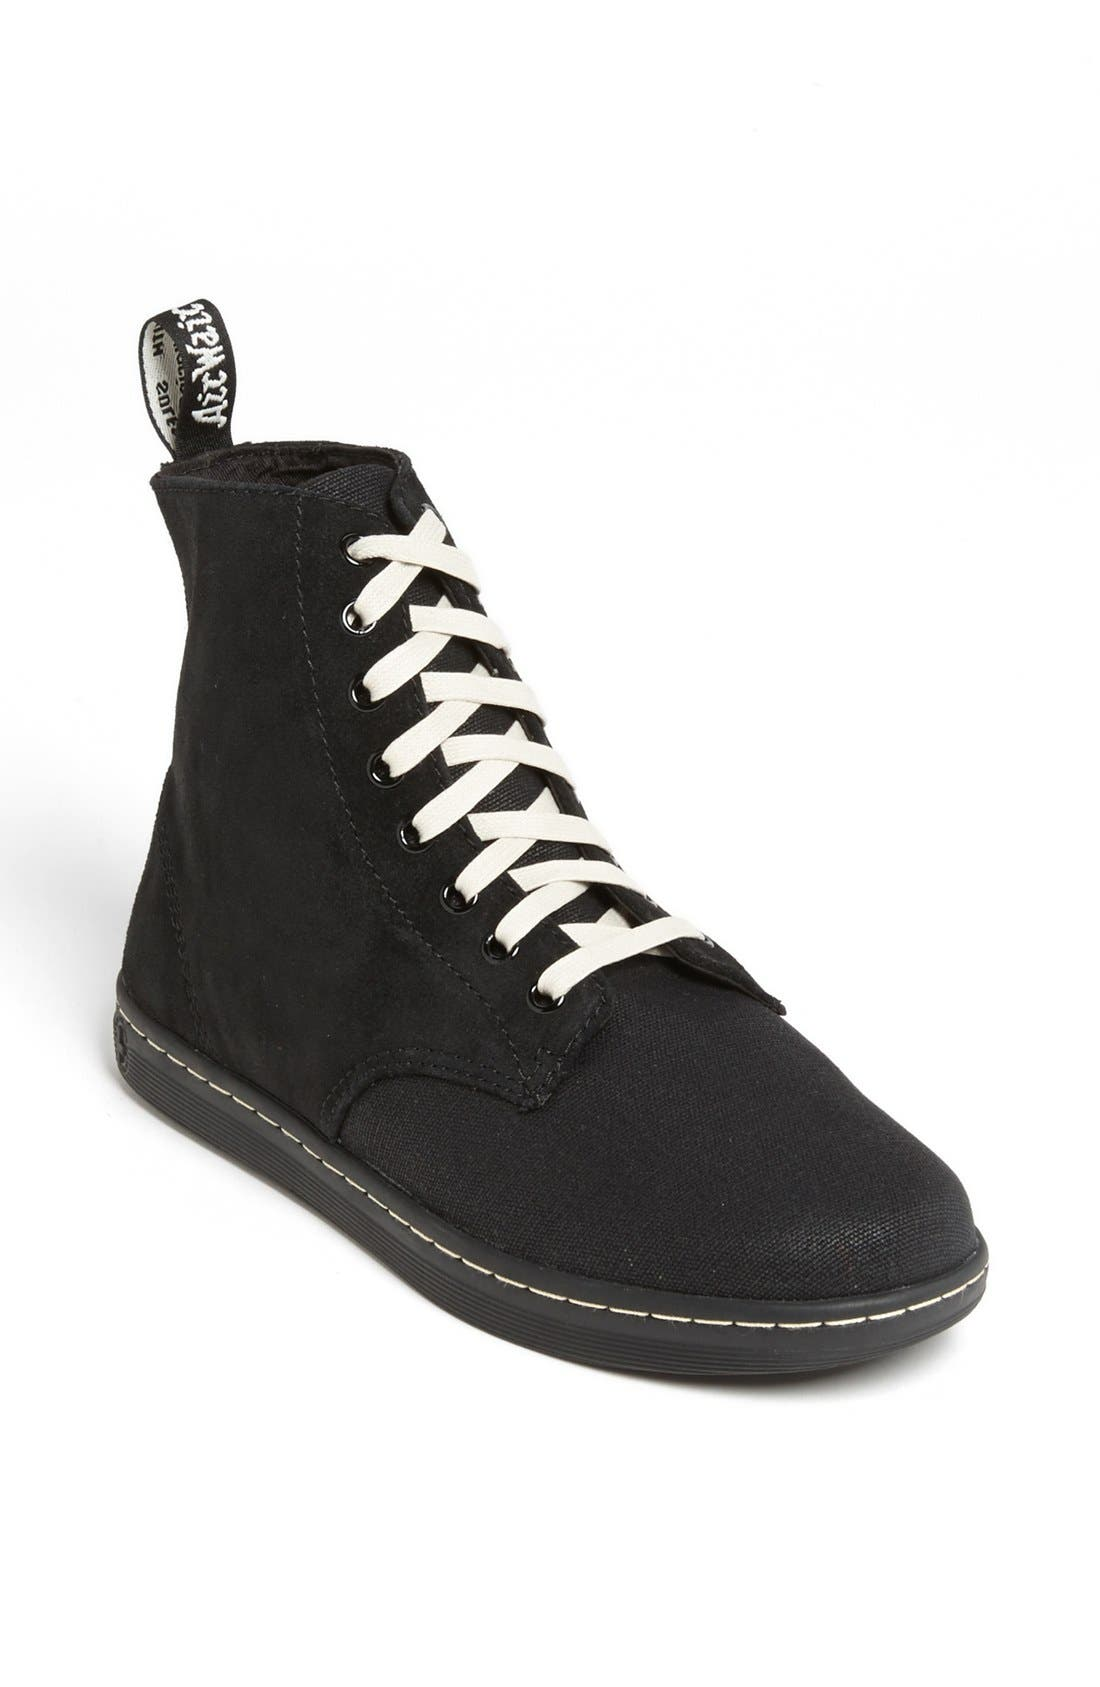 Alternate Image 1 Selected - Dr. Martens 'Alfie' Sneaker